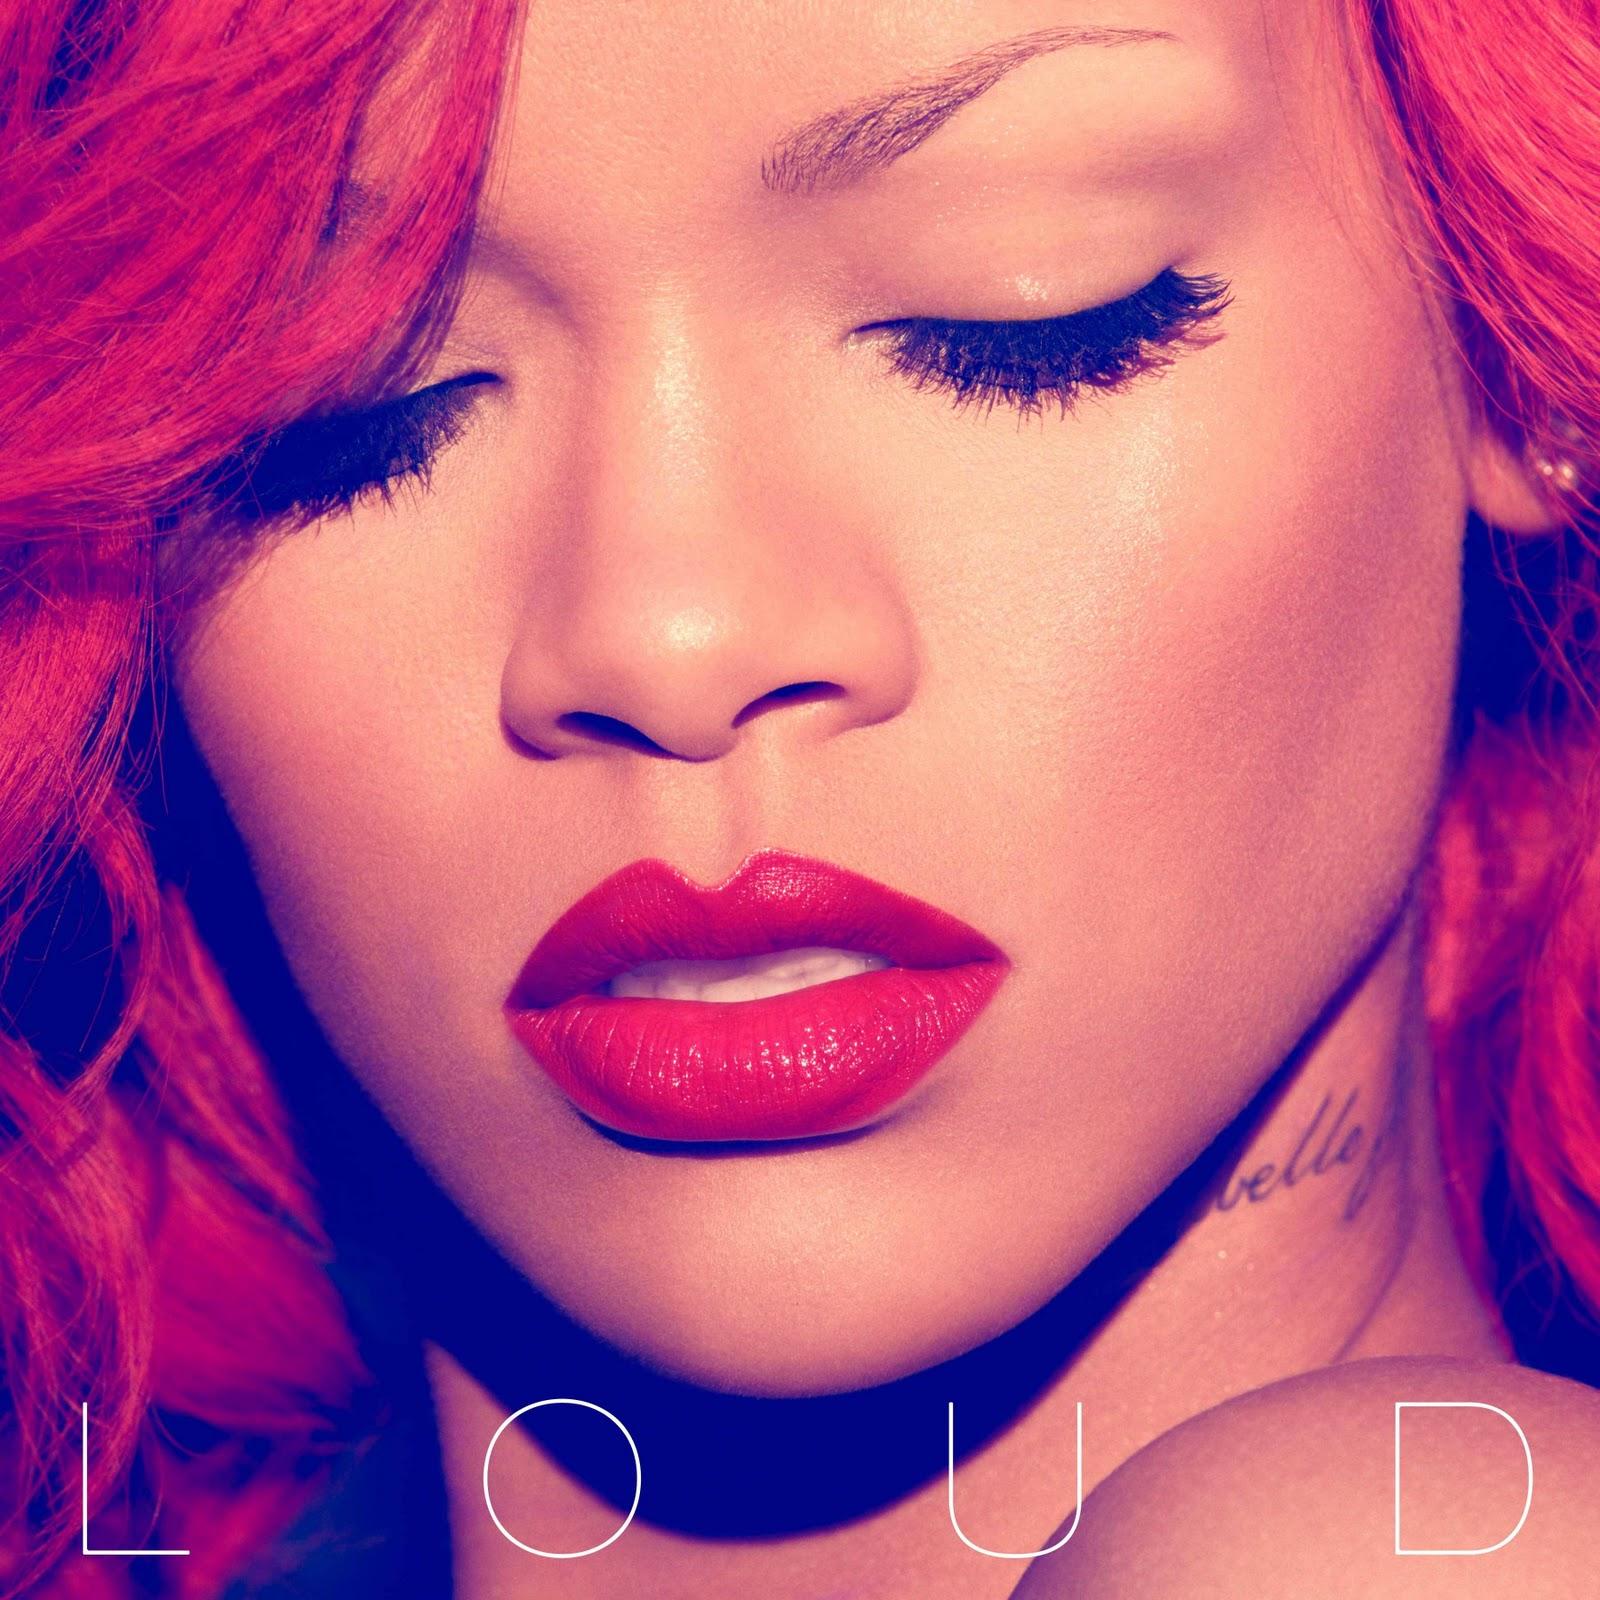 Rihanna blogspot download